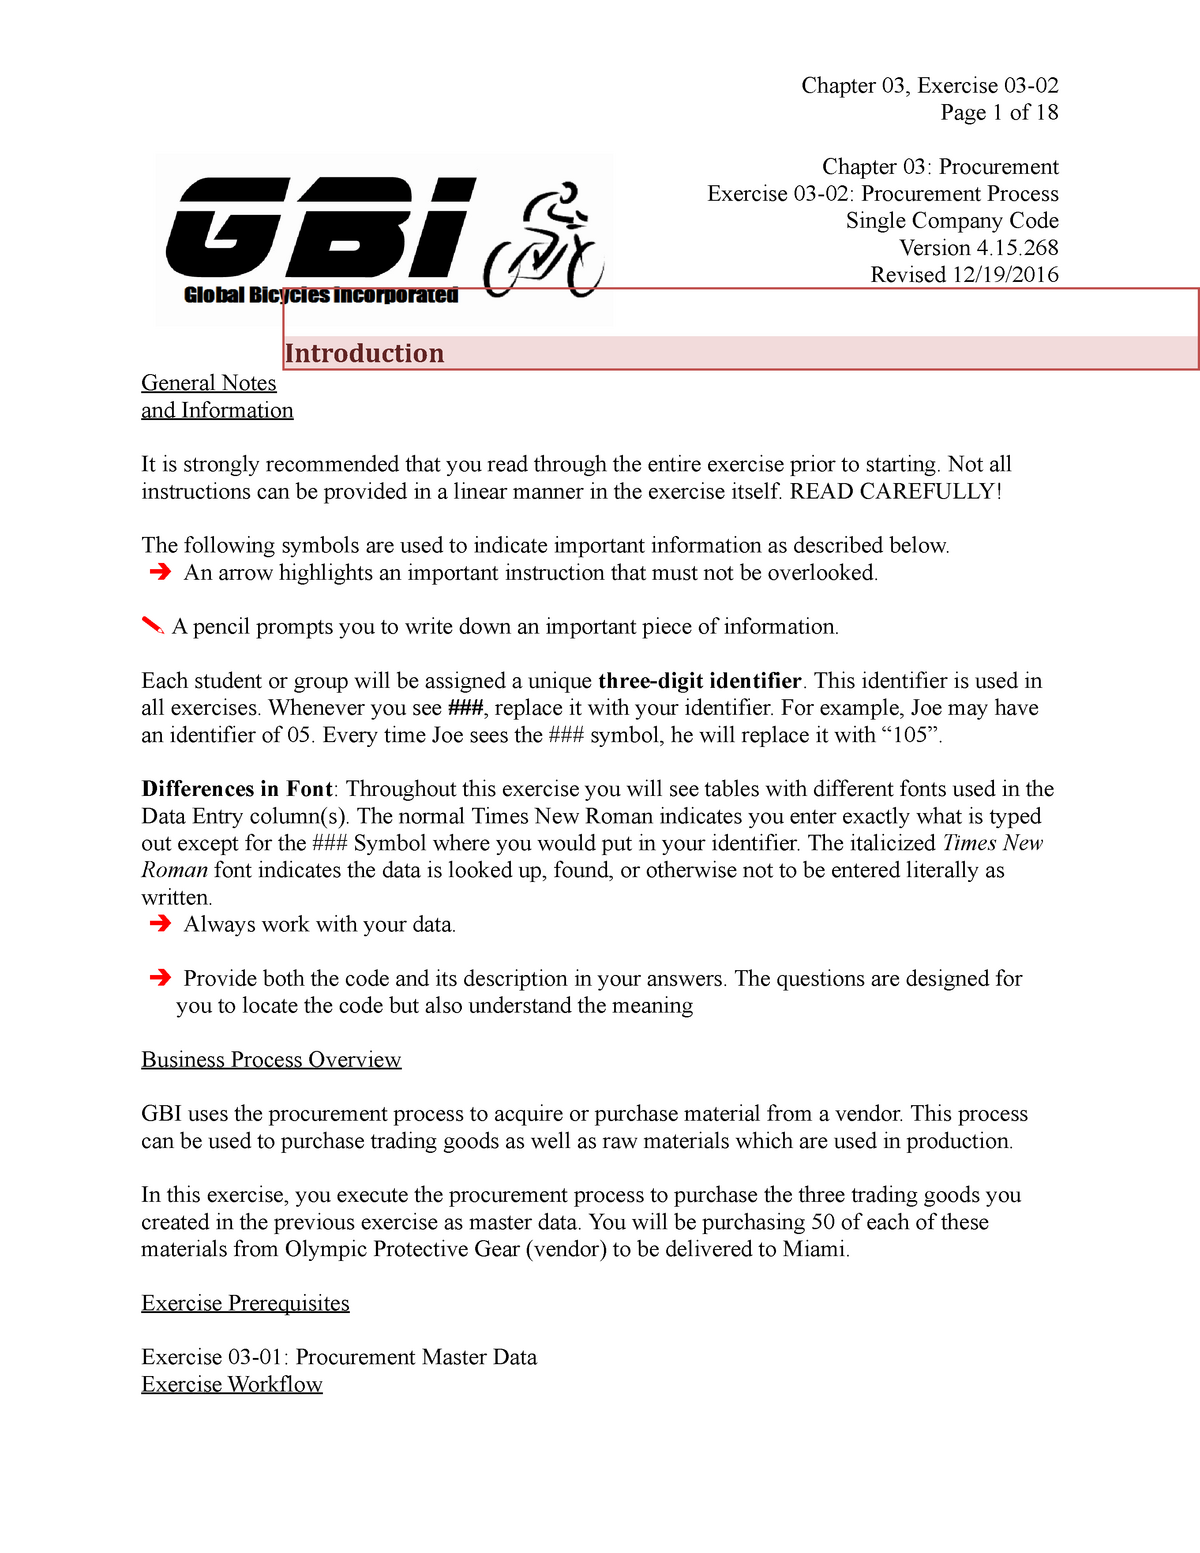 MGT 268 Ch-03-02 Procurement Process - SCC V4 15 268